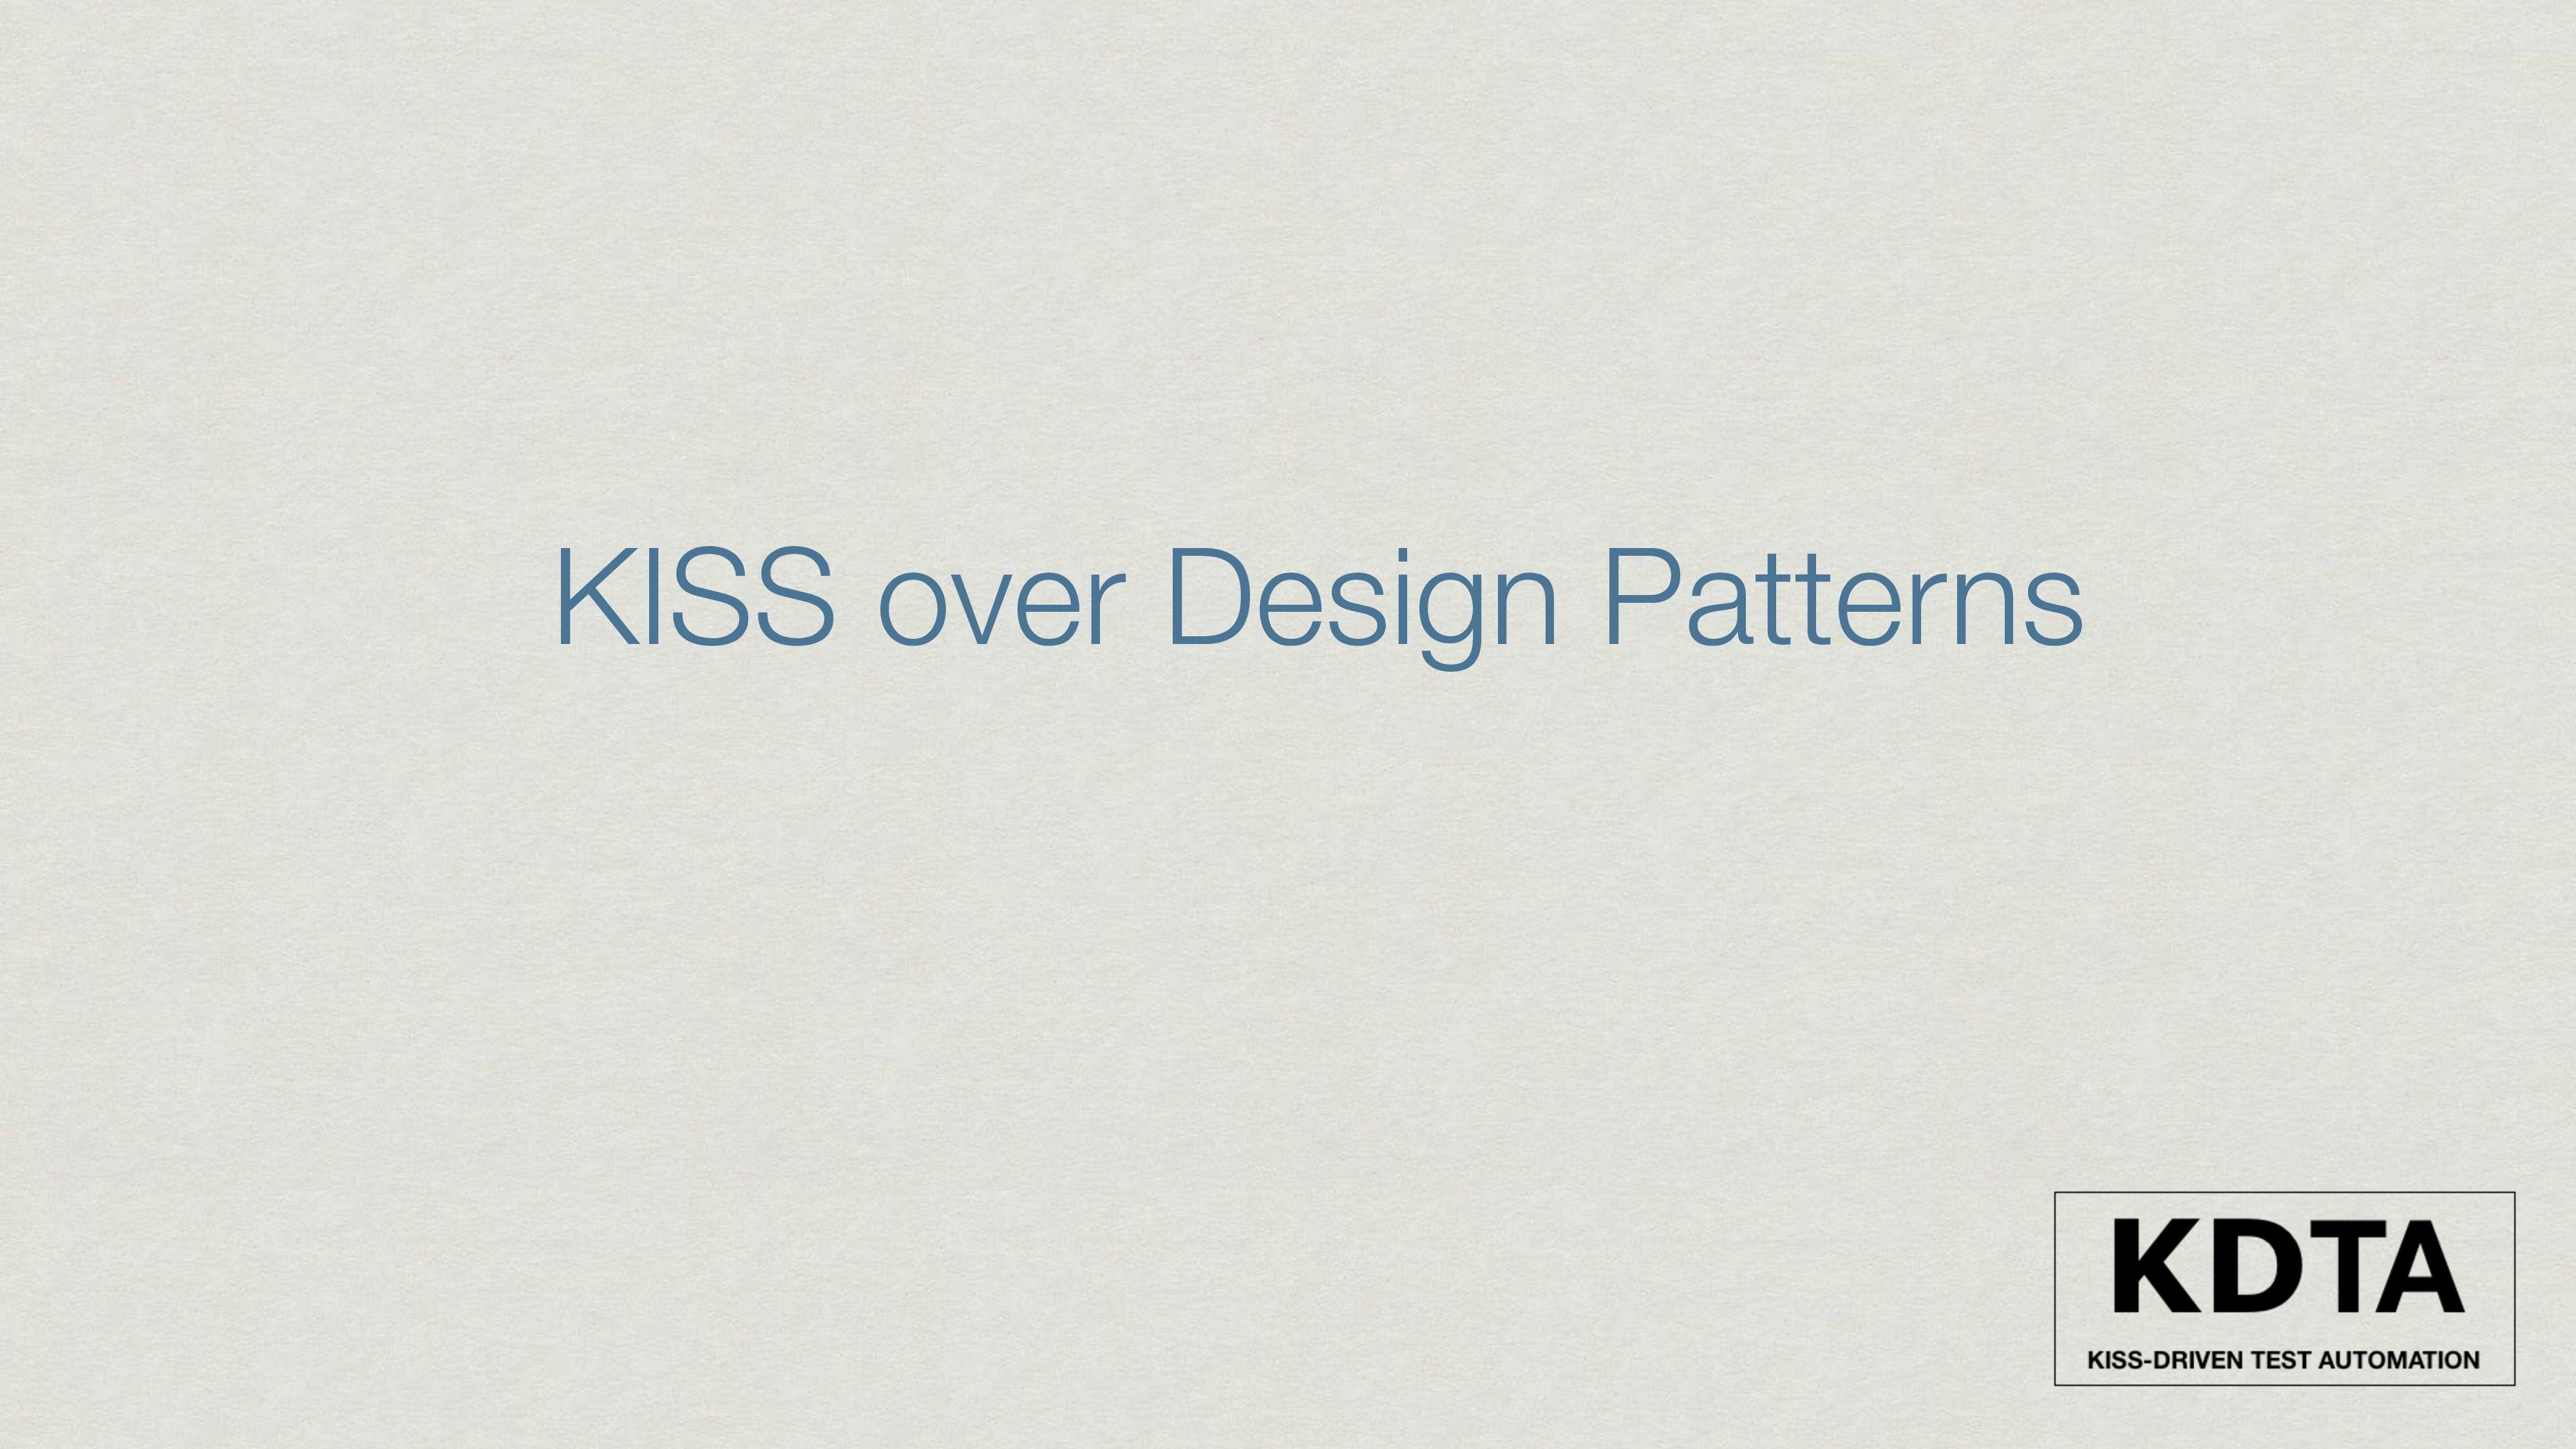 KISS over Design Patterns